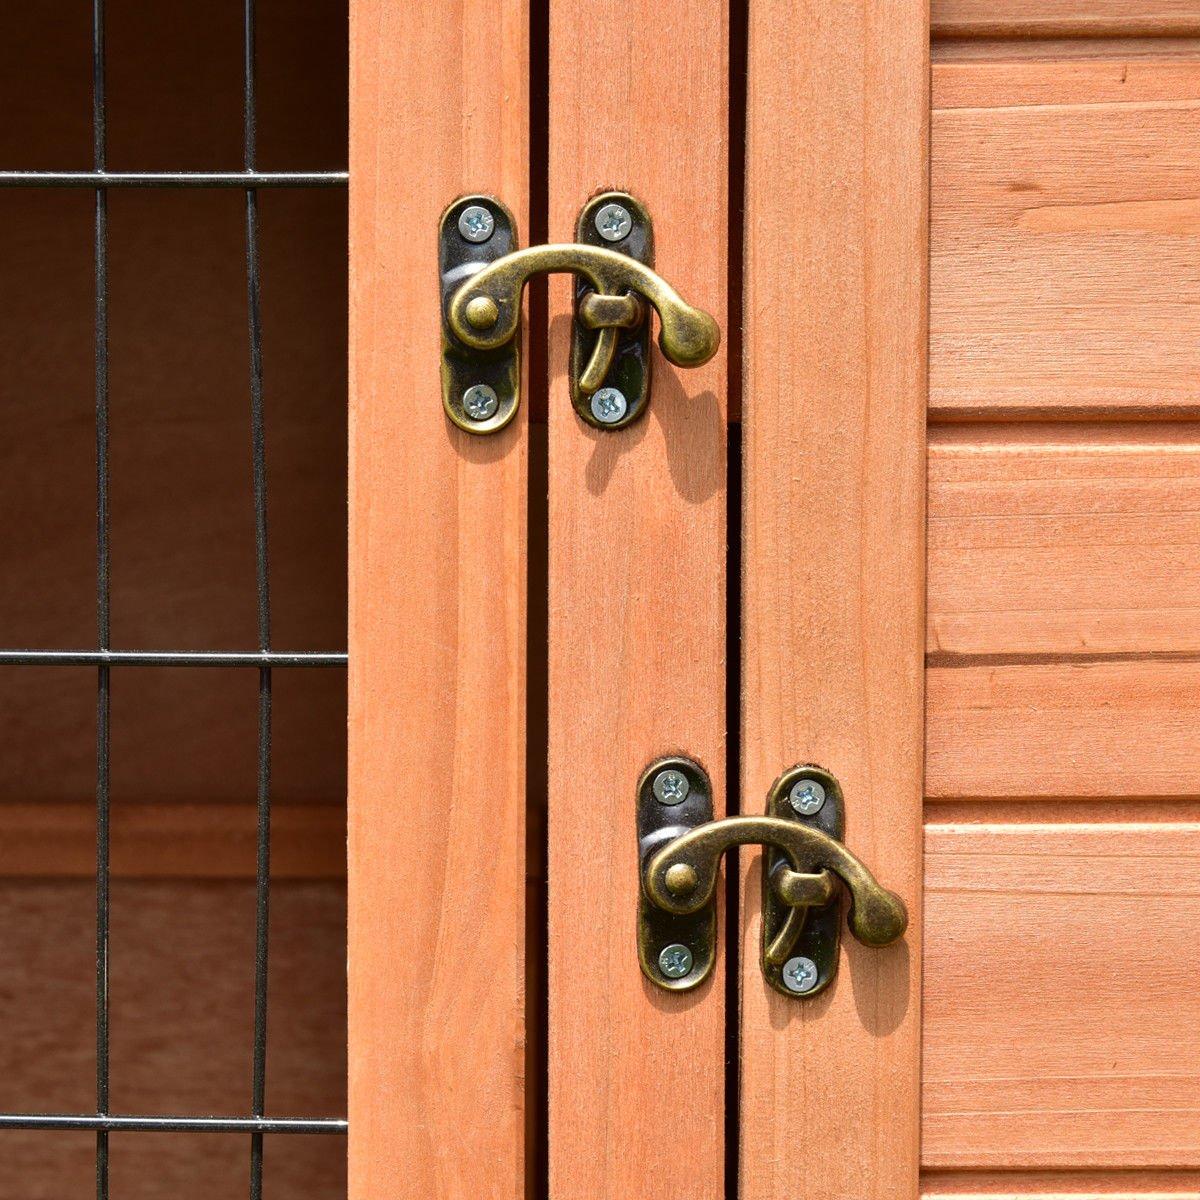 Tangkula Chicken Coop 48'' Rabbit Hutch Wooden Garden Backyard Bunny Hen House Pet Supplies with Ladder by Tangkula (Image #9)